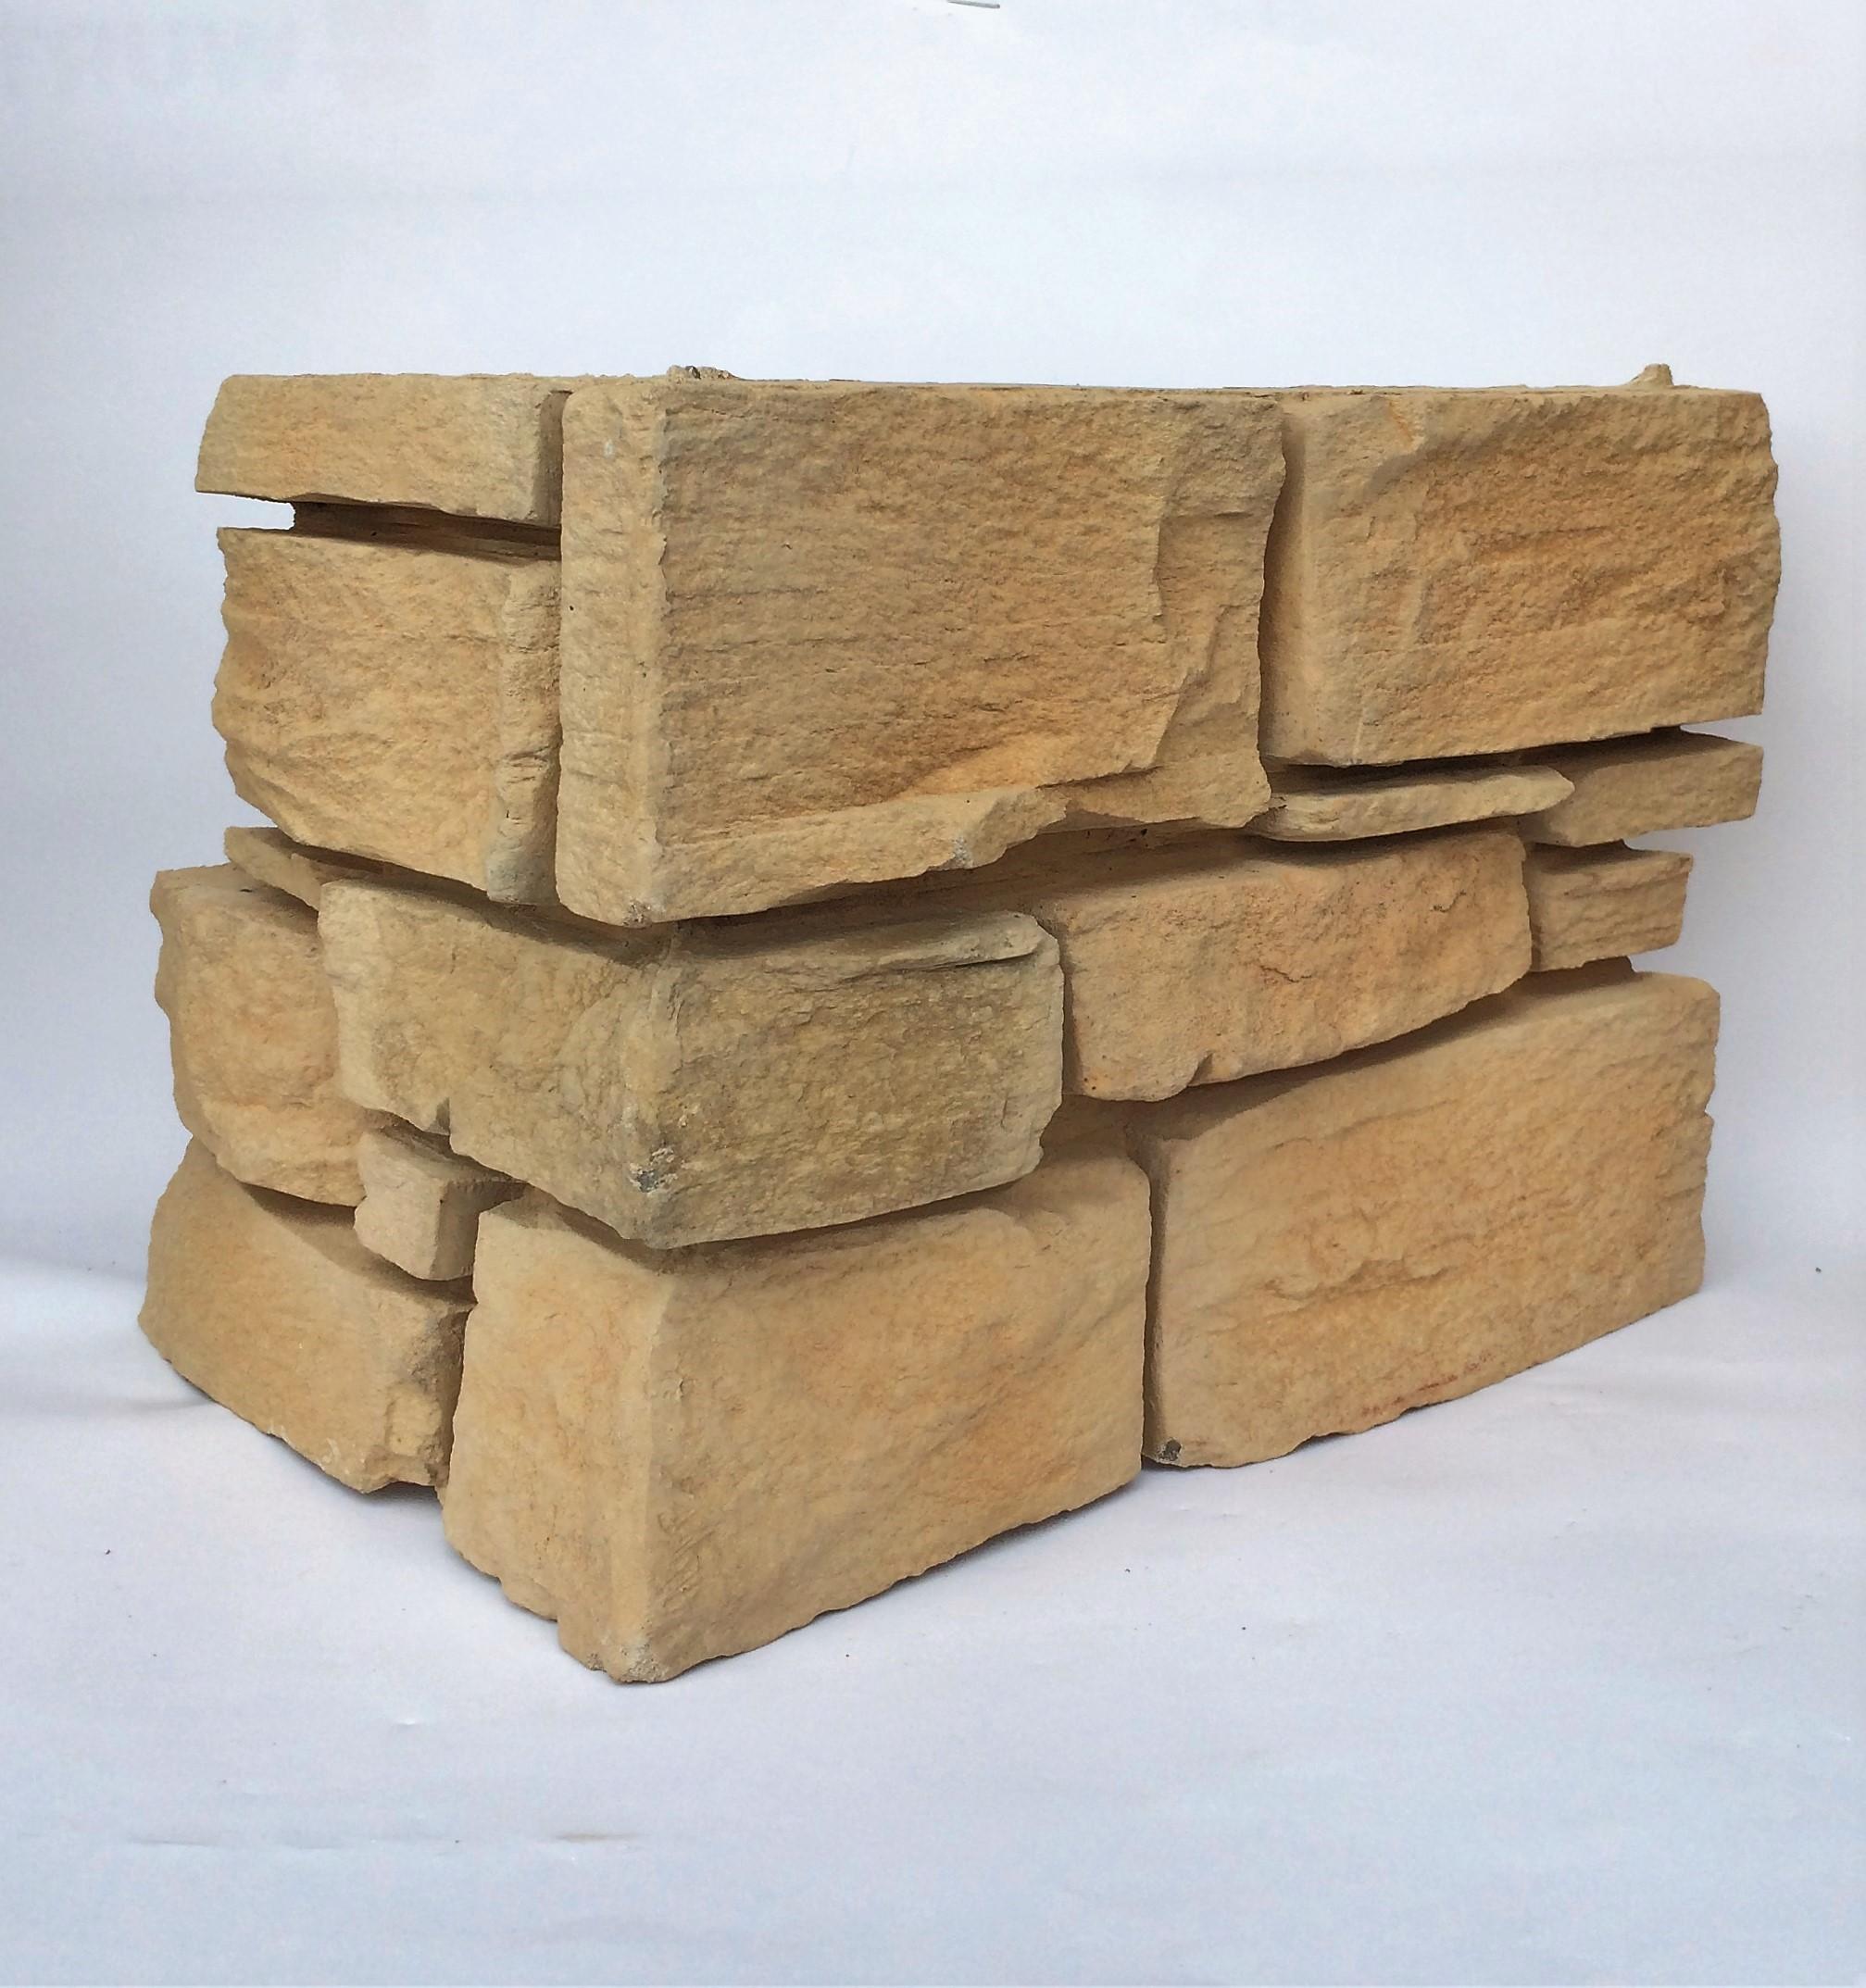 kamenné obklady Castelo, imitace kamene do interiéru, dekorační kámen do interiéru a exteriéru